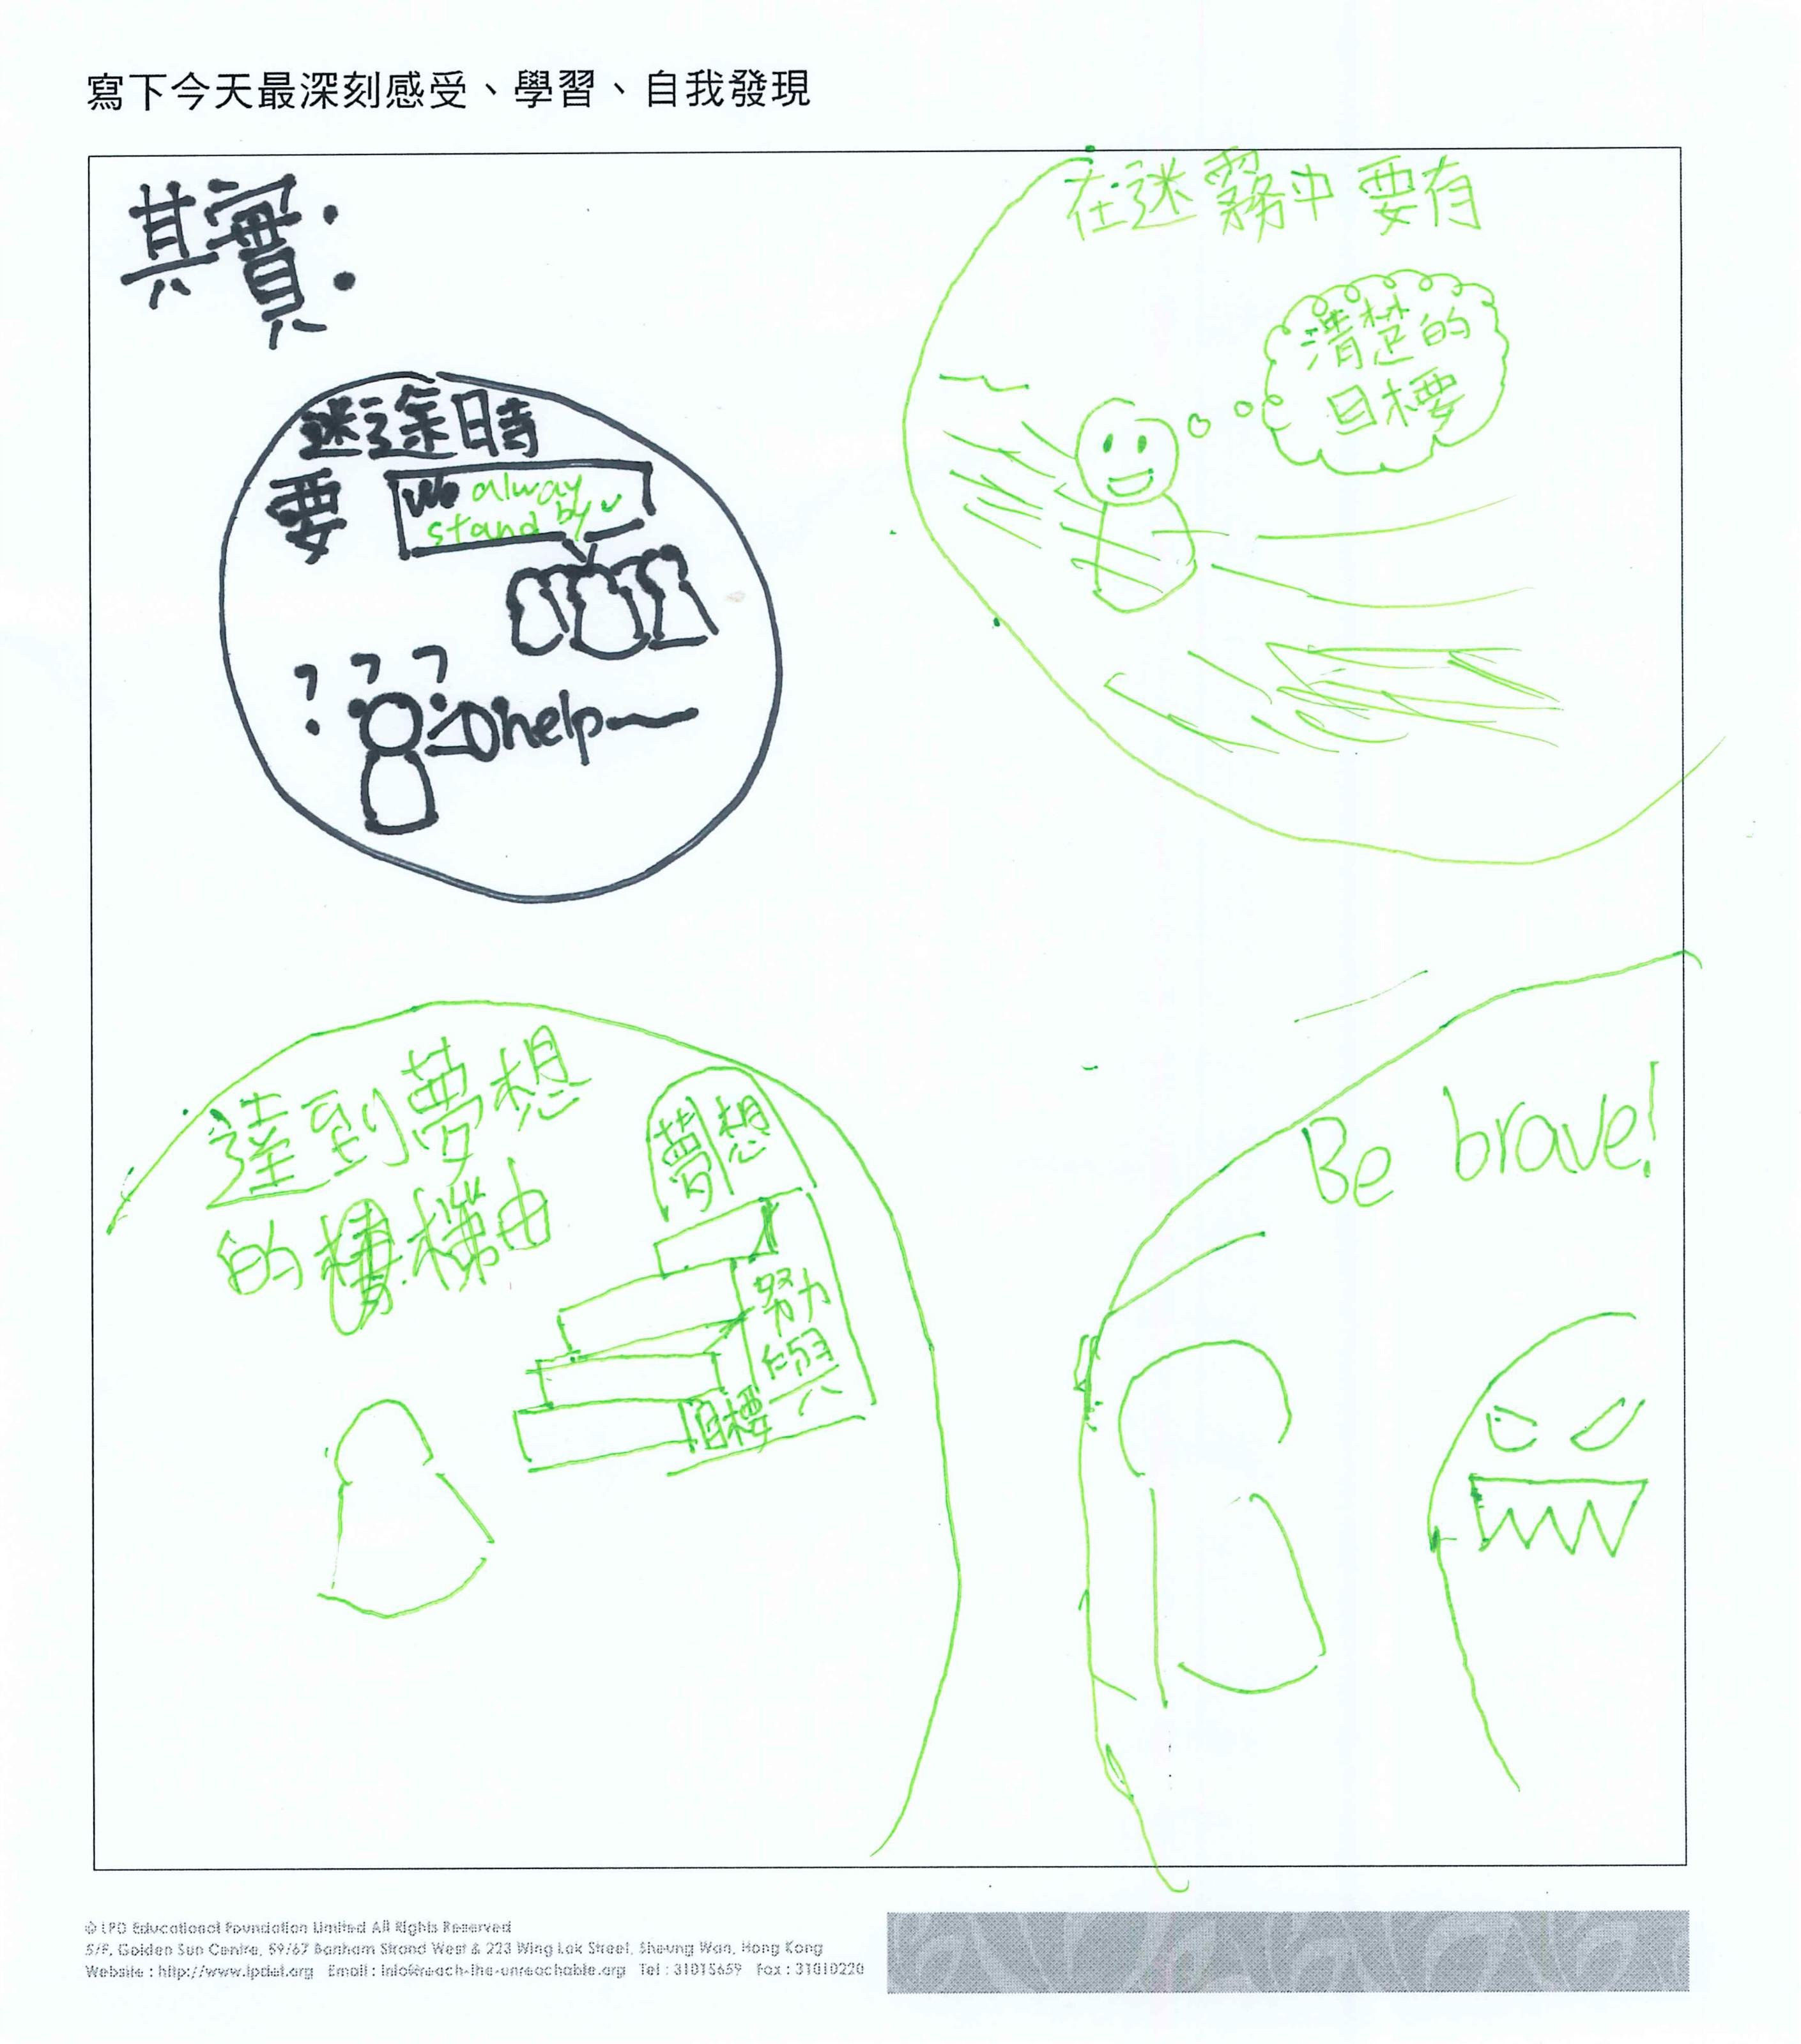 csm-feedback2